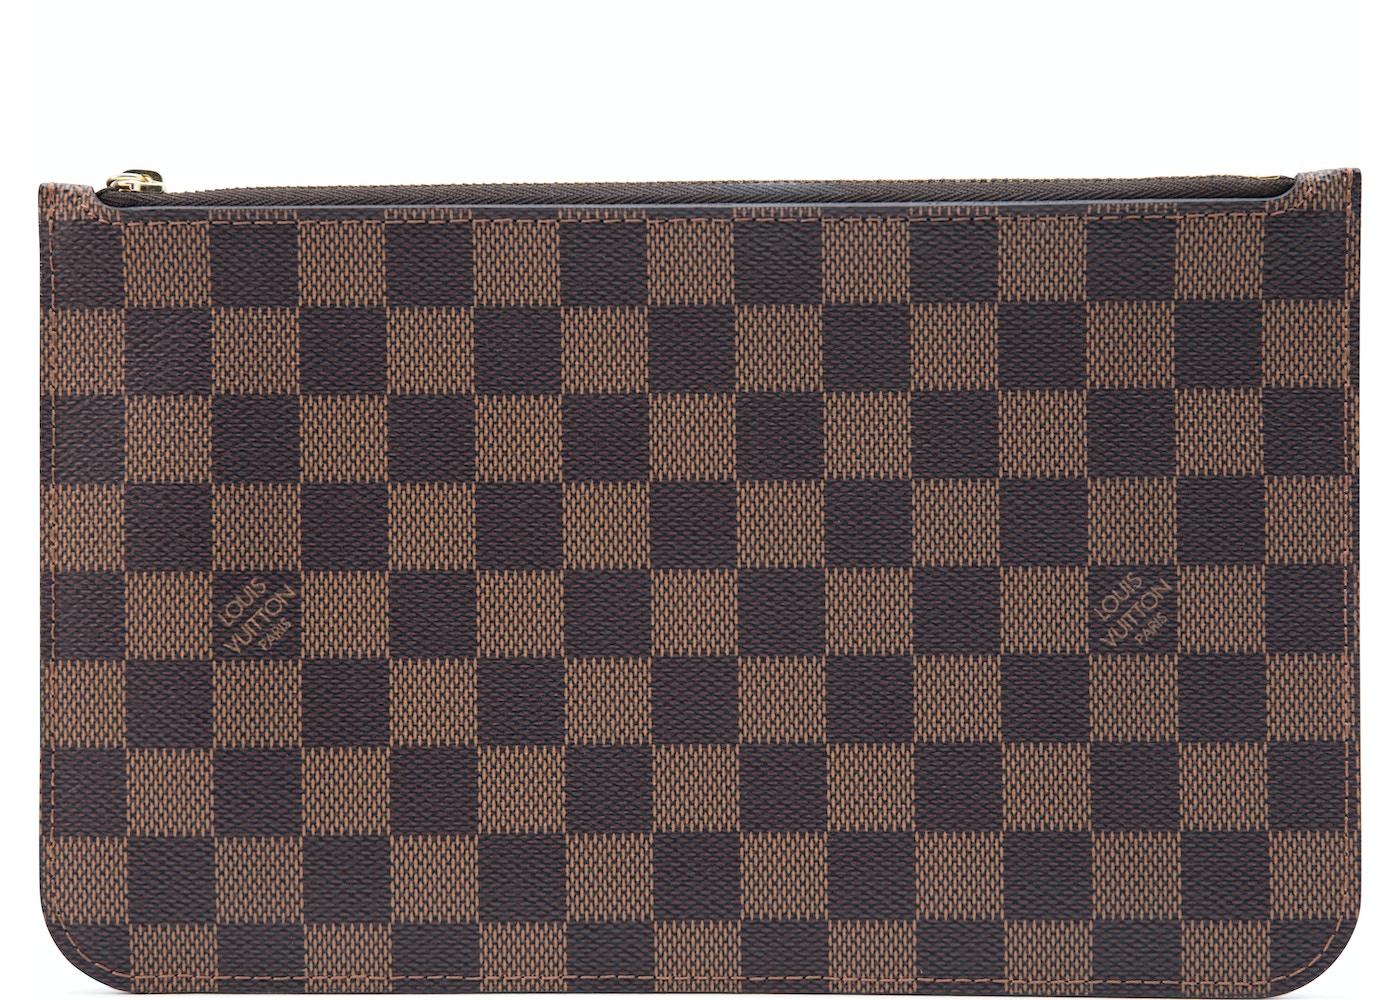 d4db6a1b2dfa Louis Vuitton Neverfull Pochette Damier Ebene (Without Strap) Brown